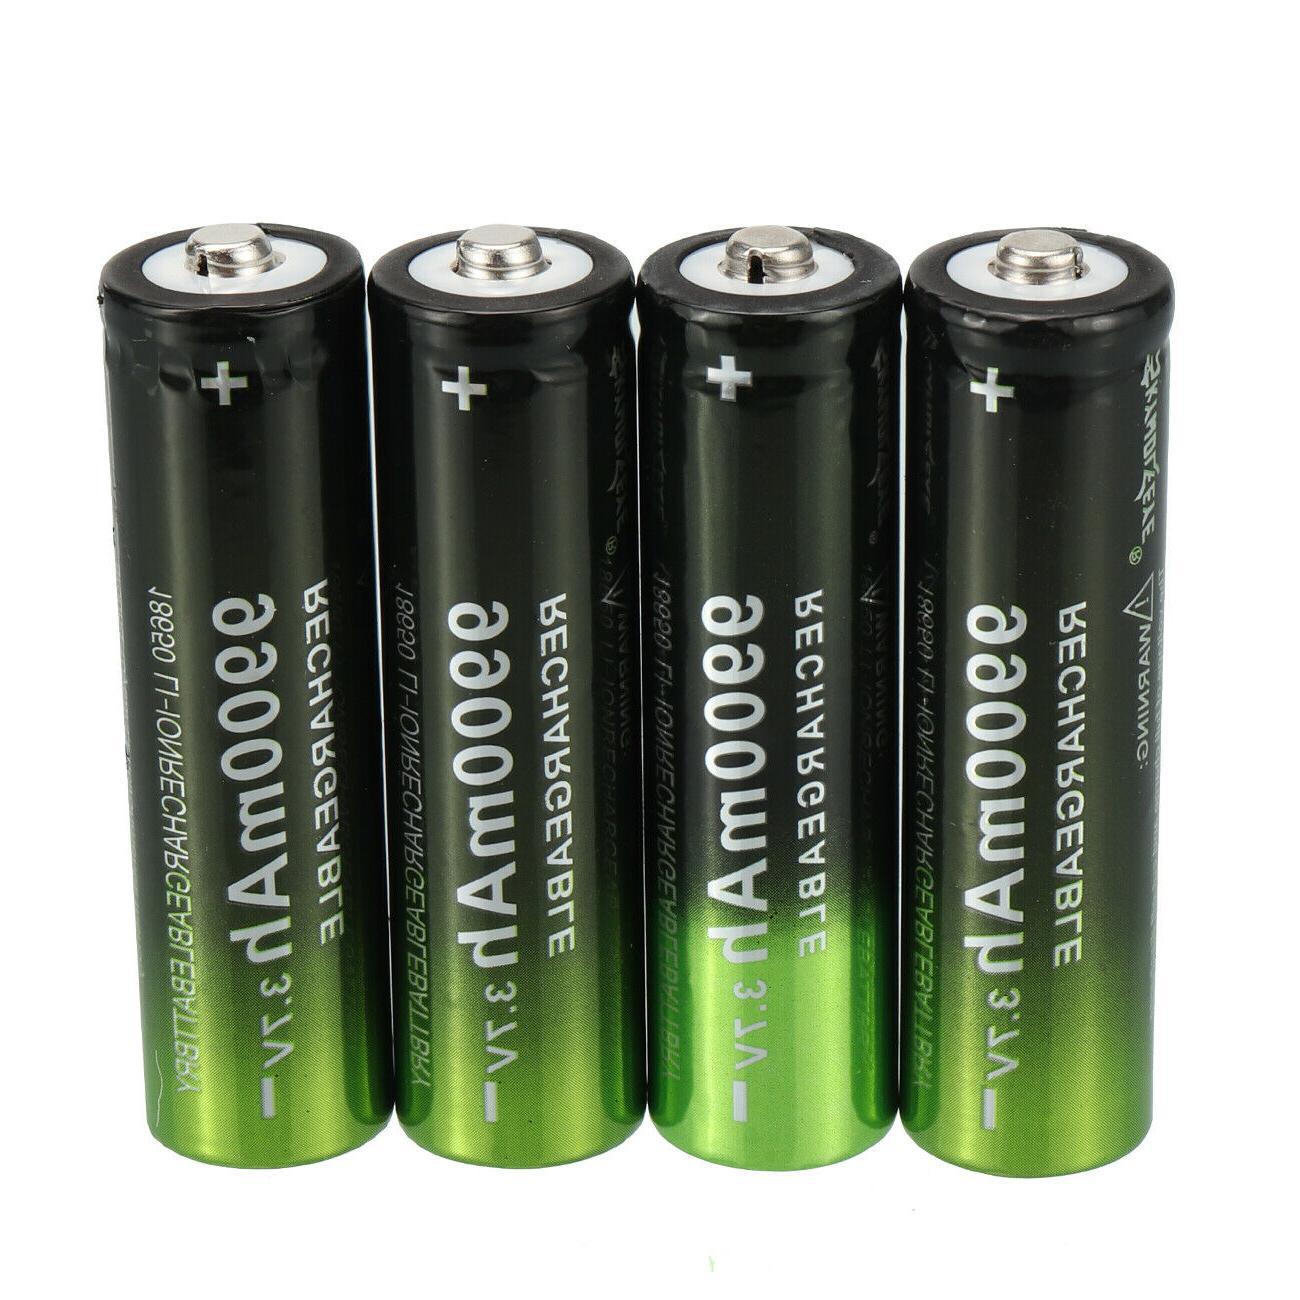 10X Battery 3.7V Li-Ion LED Headlamp